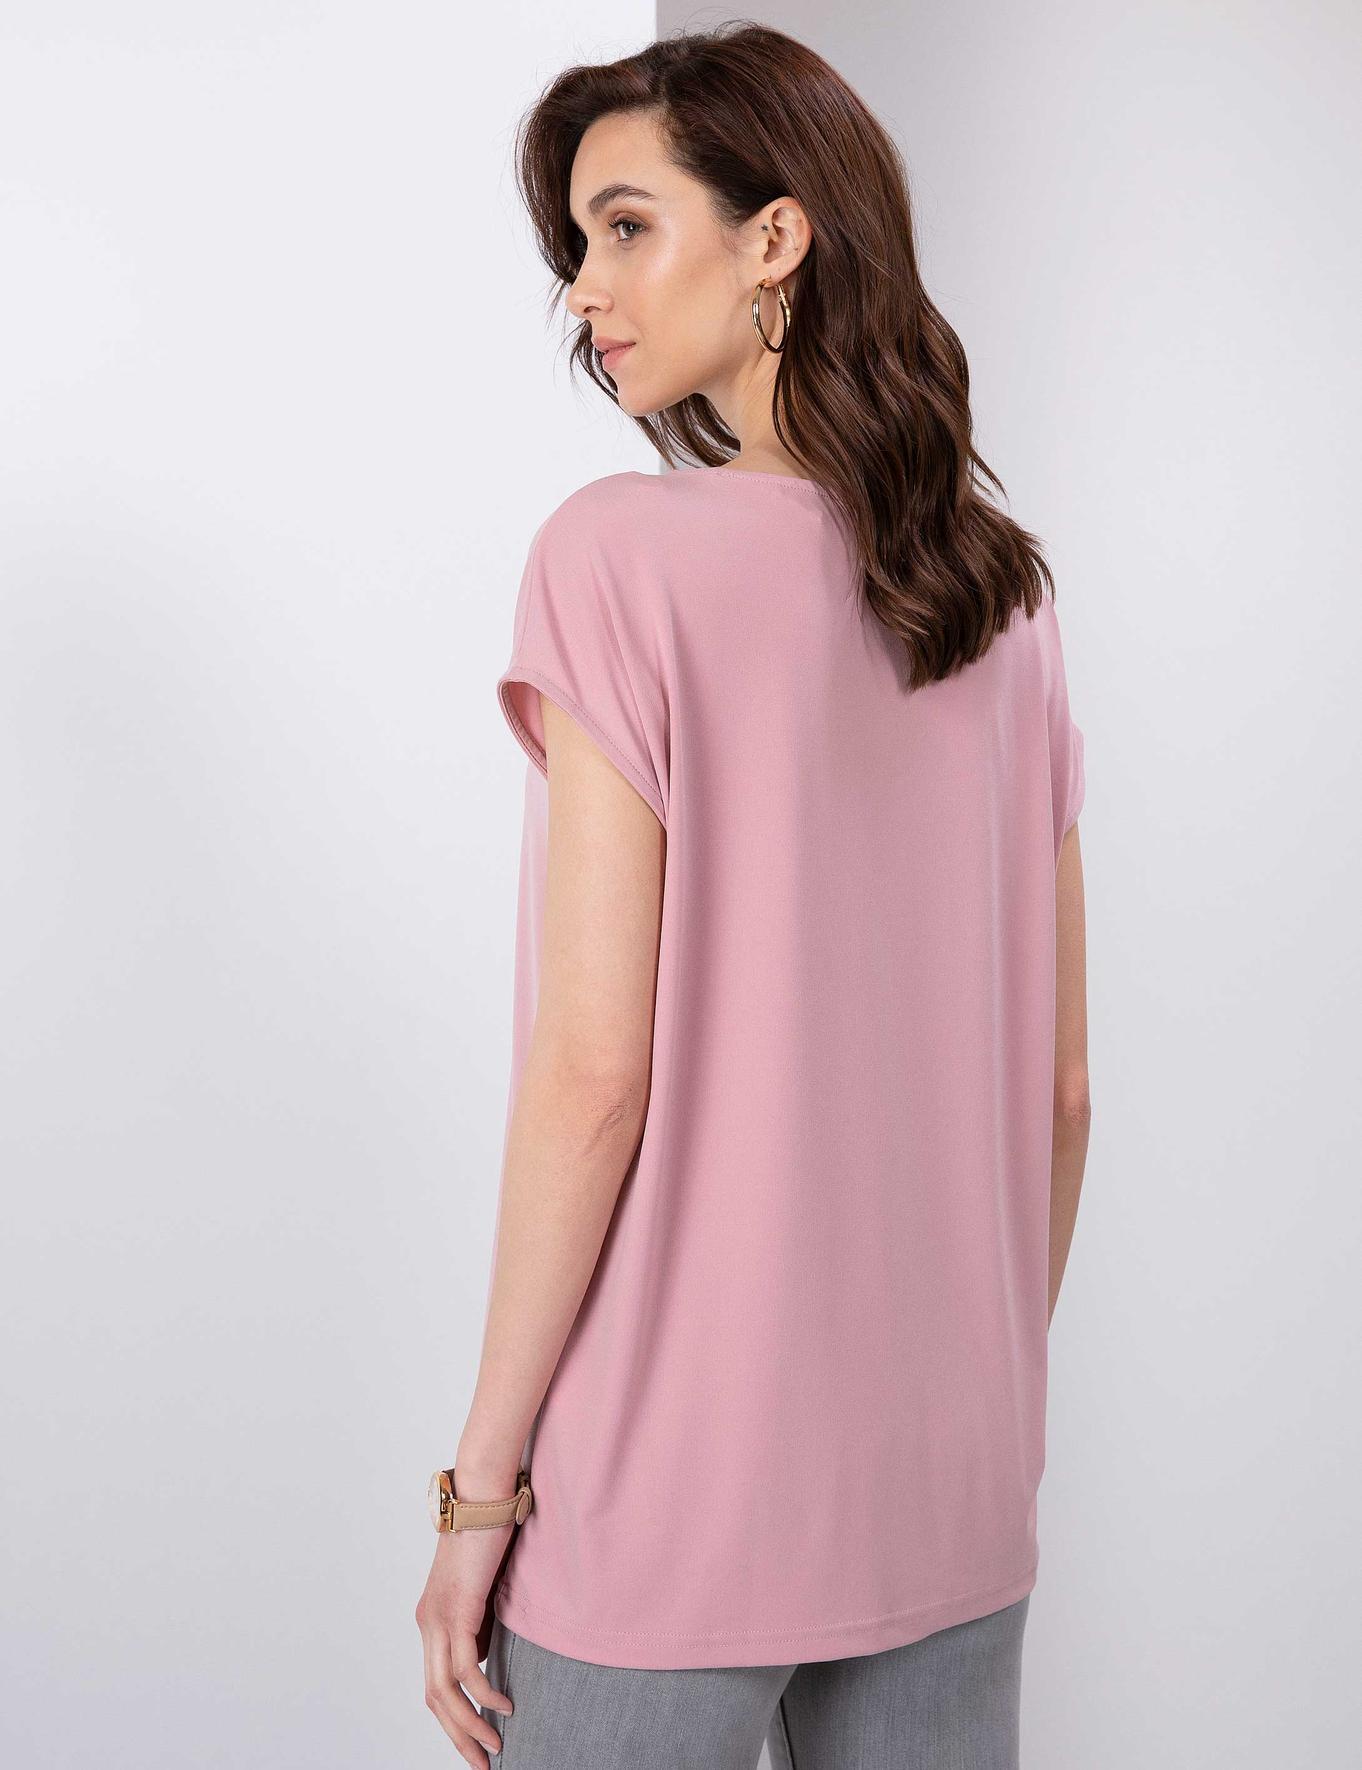 Pudra Pembe Comfort Fit Kayık Yaka T-Shirt